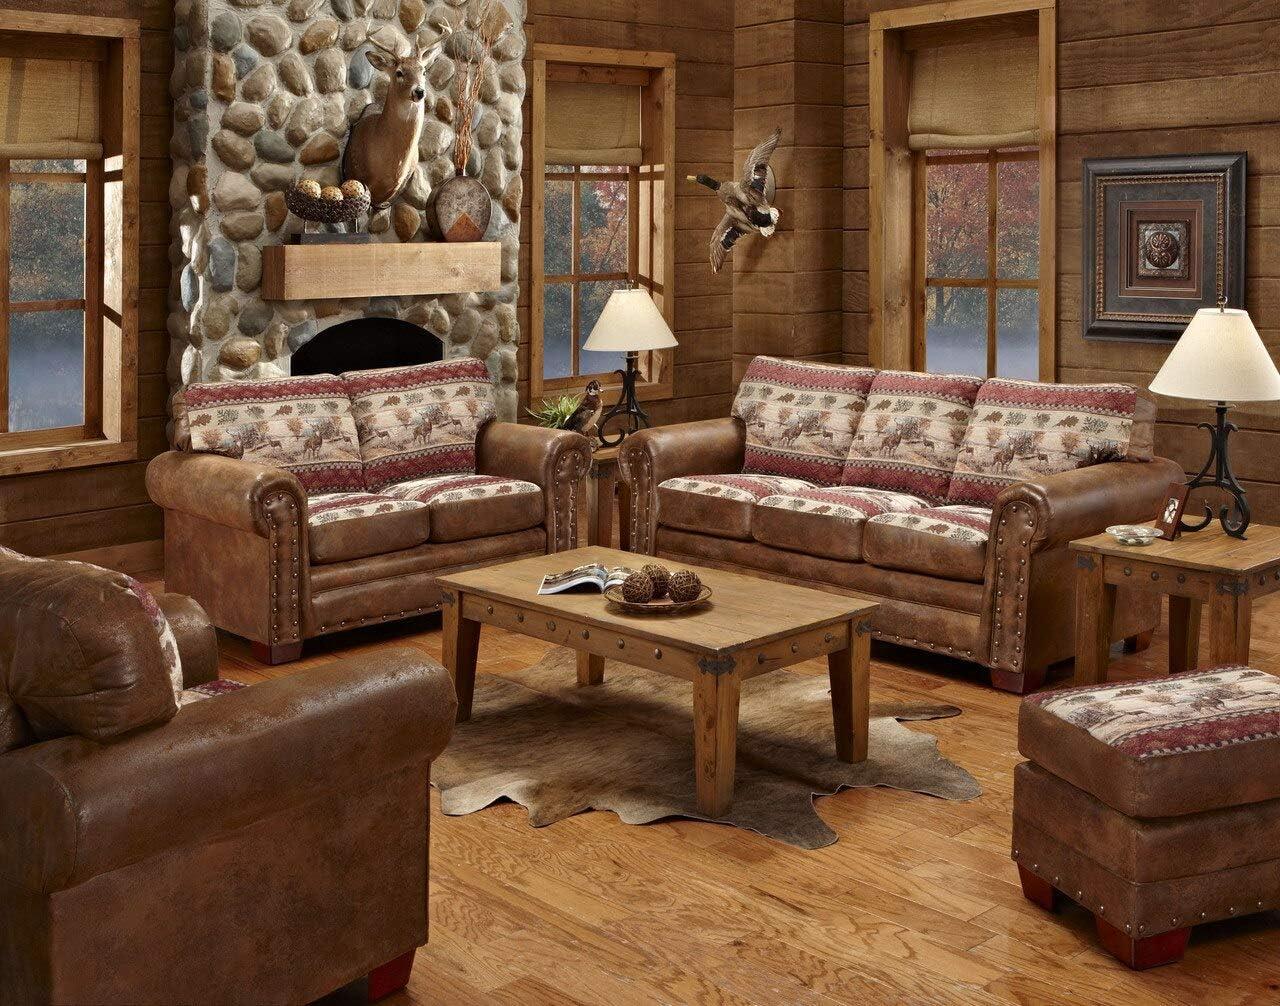 Amazon Com American Furniture Classics 4 Piece Deer Valley Sofa Furniture Decor